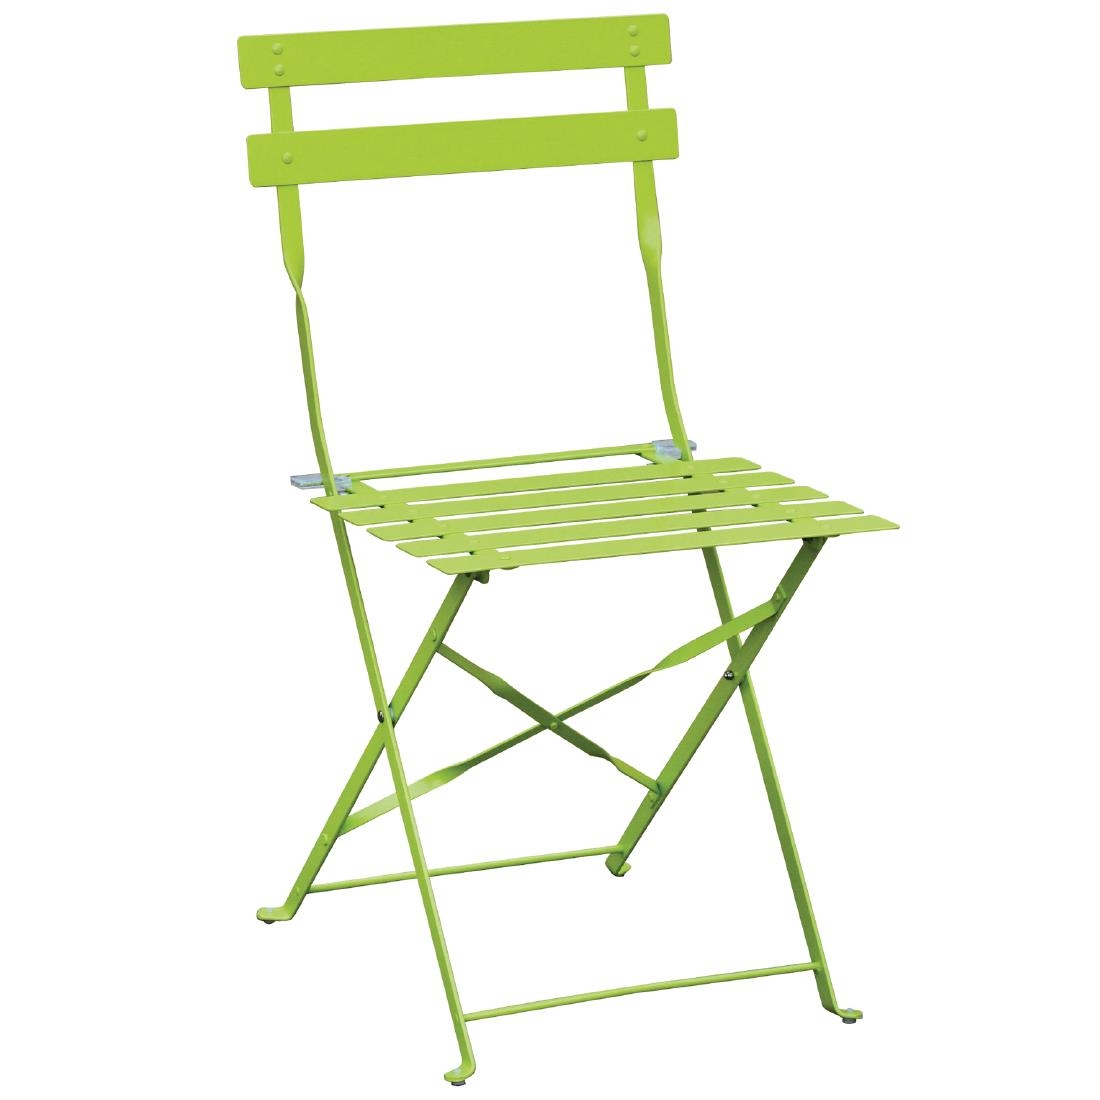 Steel Folding Chair - Lime